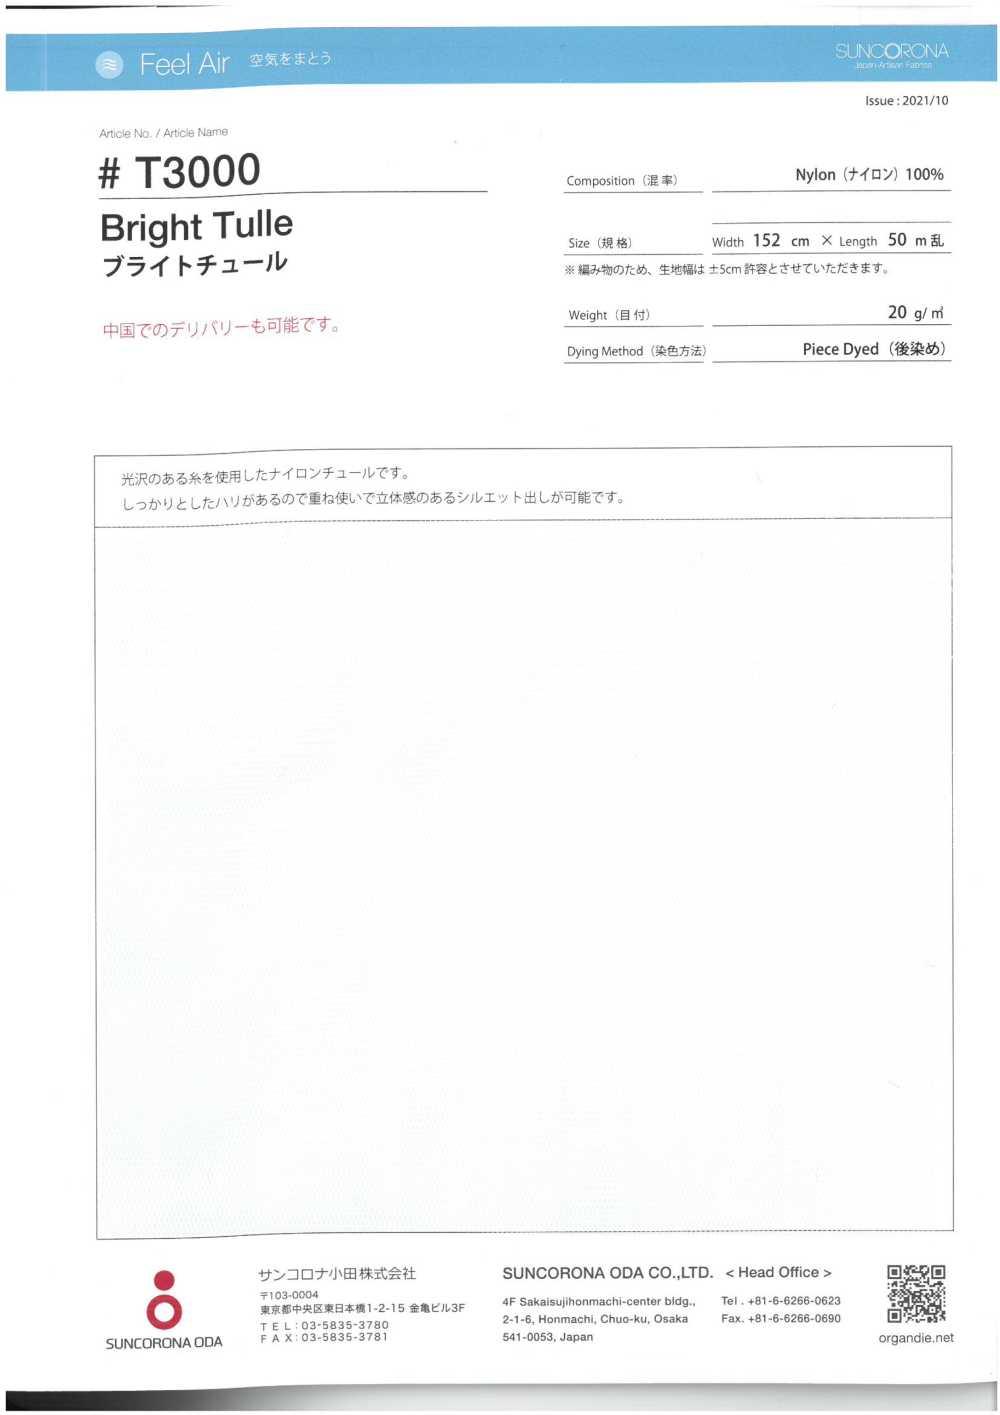 T3000 ブライトチュール[生地] サンコロナ小田/オークラ商事 - ApparelX アパレル資材卸通販